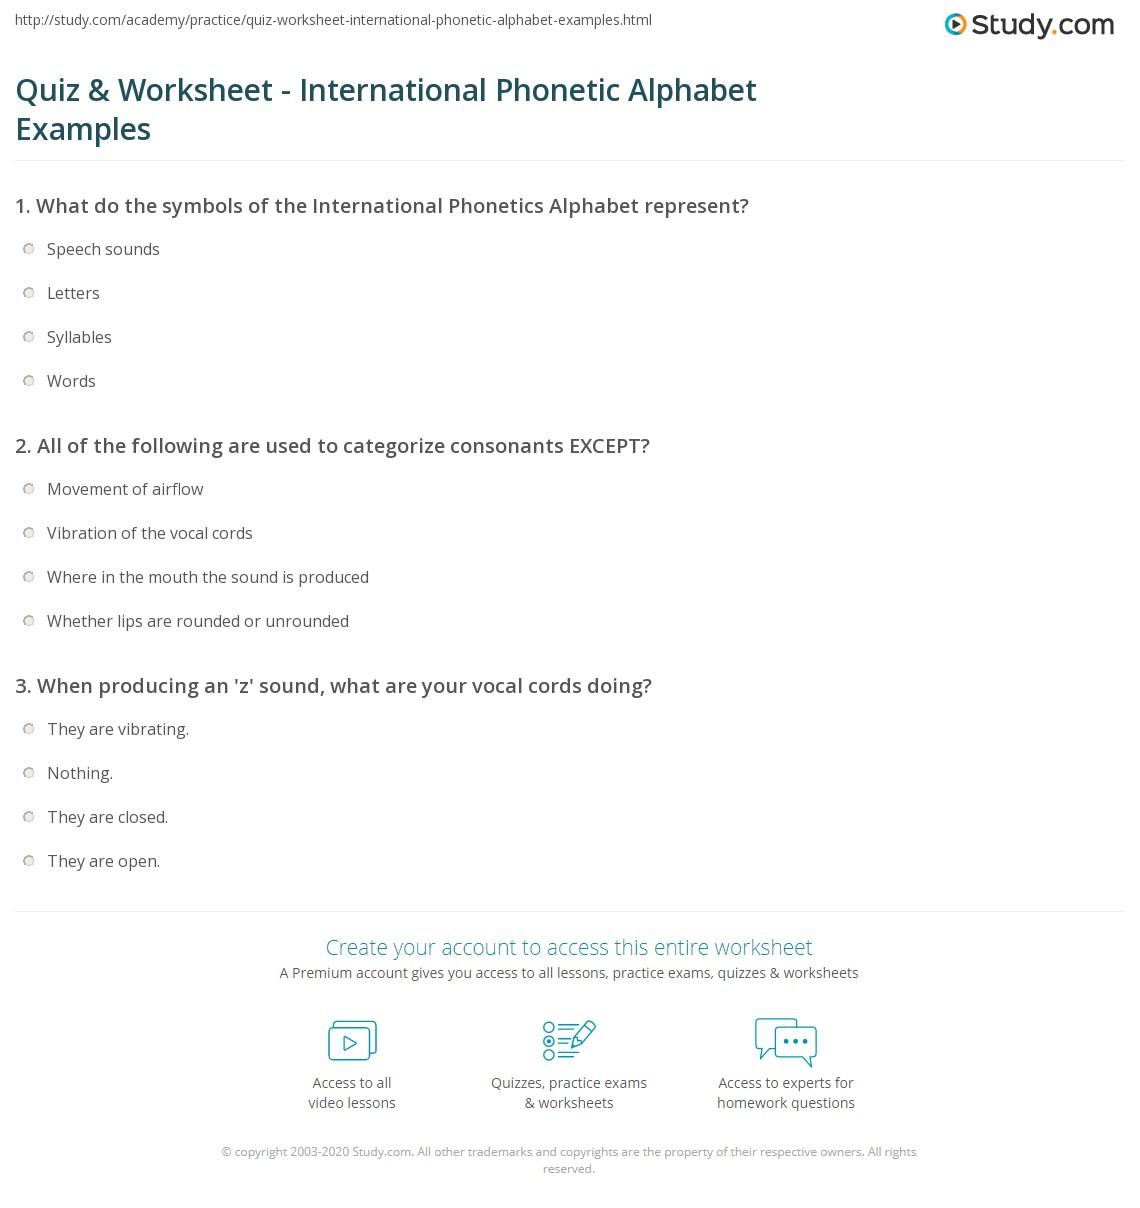 International Phonetic Alphabet Worksheet